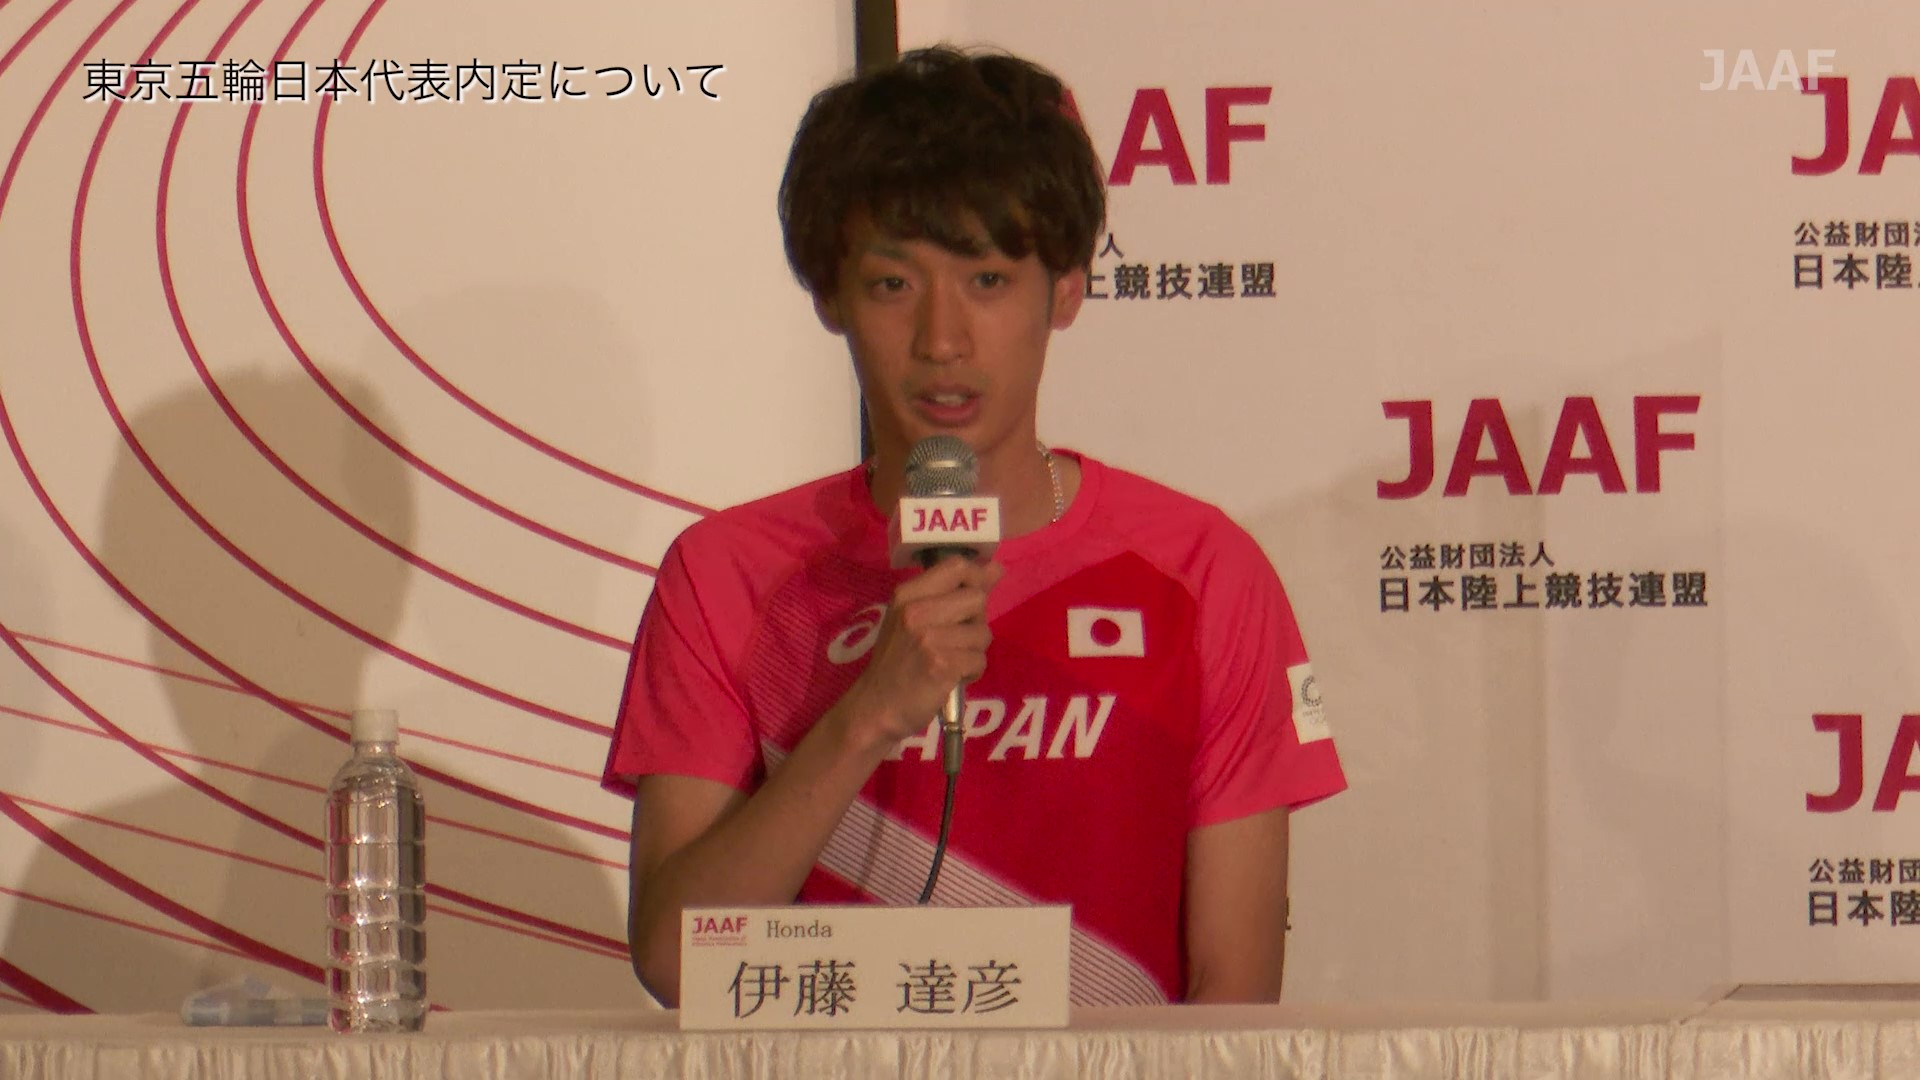 東京オリンピック日本代表内定会見/陸上男女10000m